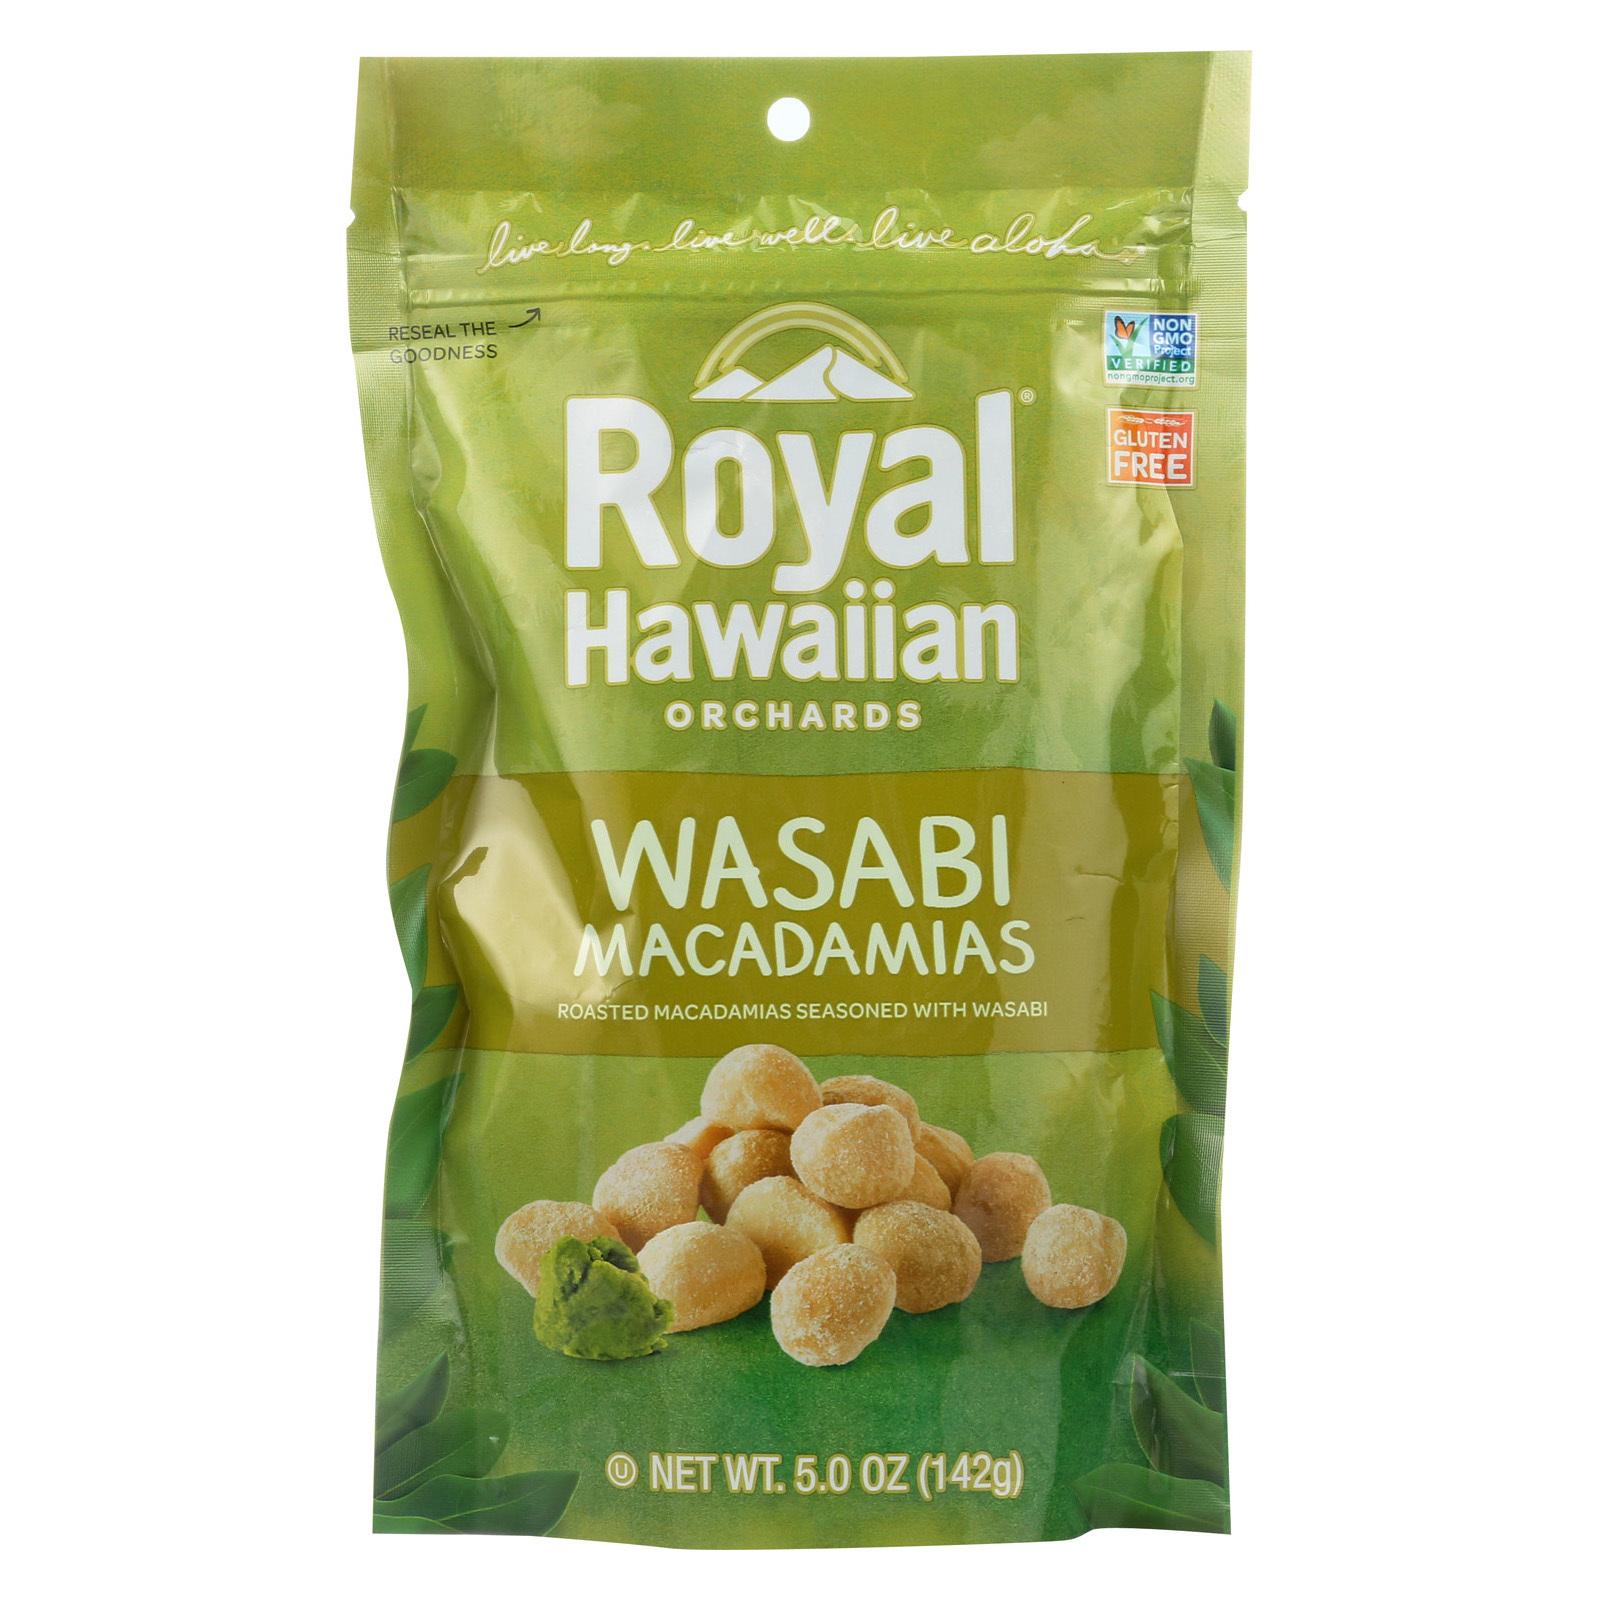 Royal Hawaiian Orchards Macadamias - Wasabi and Soy - Case of 6 - 5 oz.